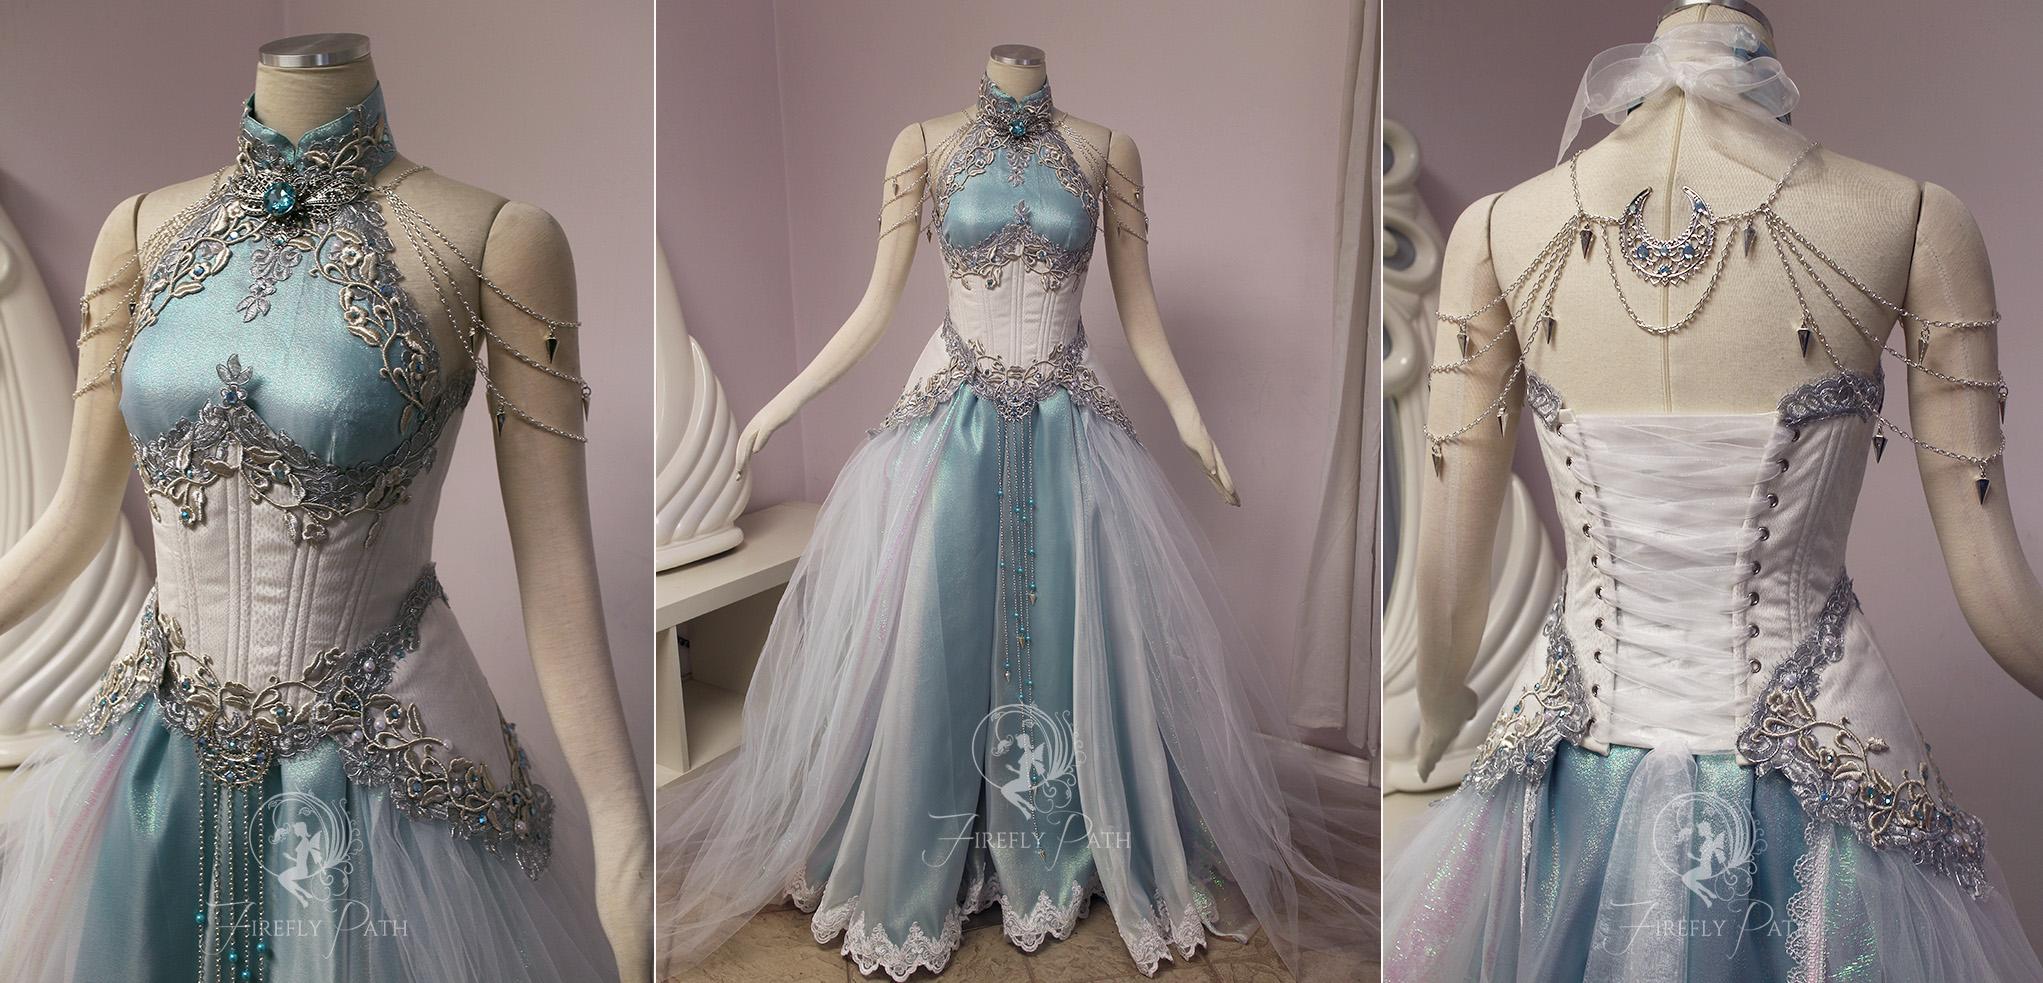 Elves Anime in Victorian Dresses